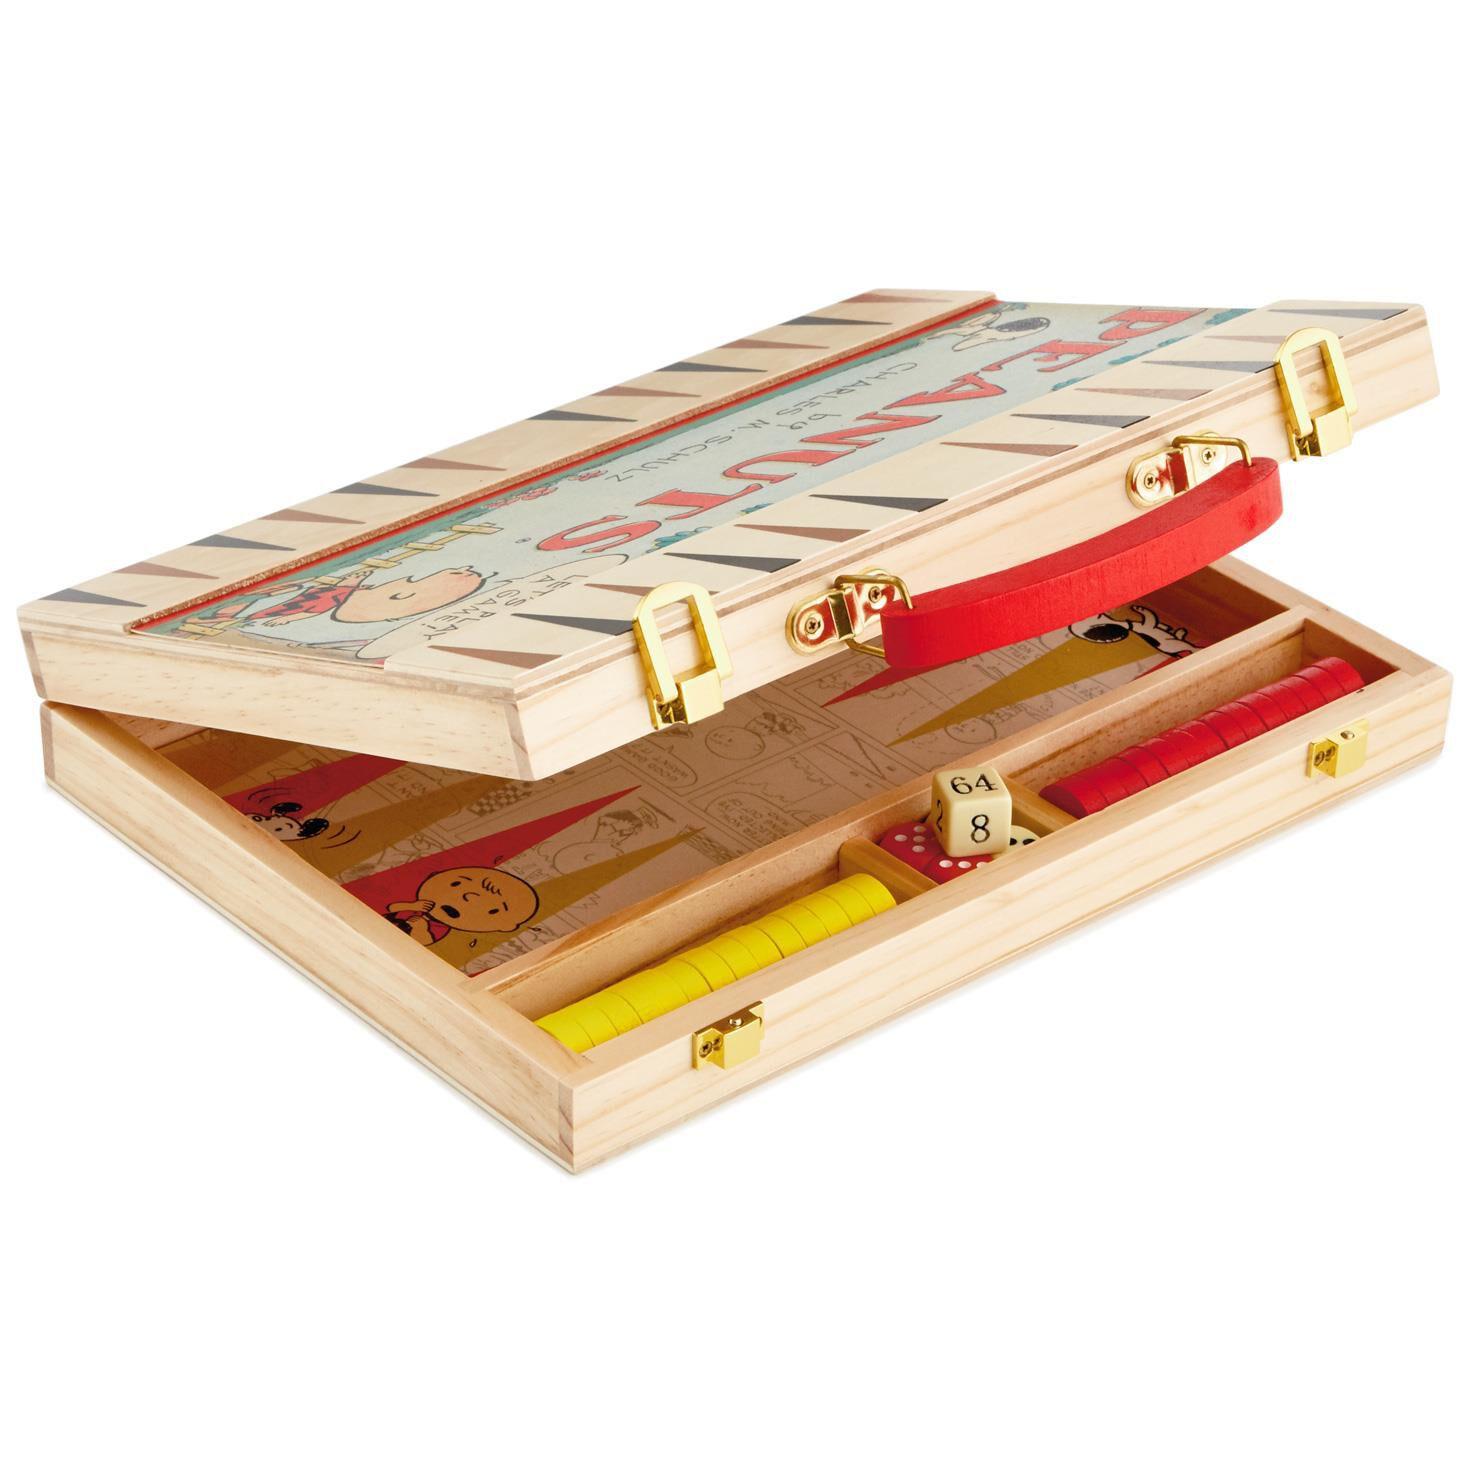 peanuts backgammon game set peanuts backgammon game set - Backgammon Game